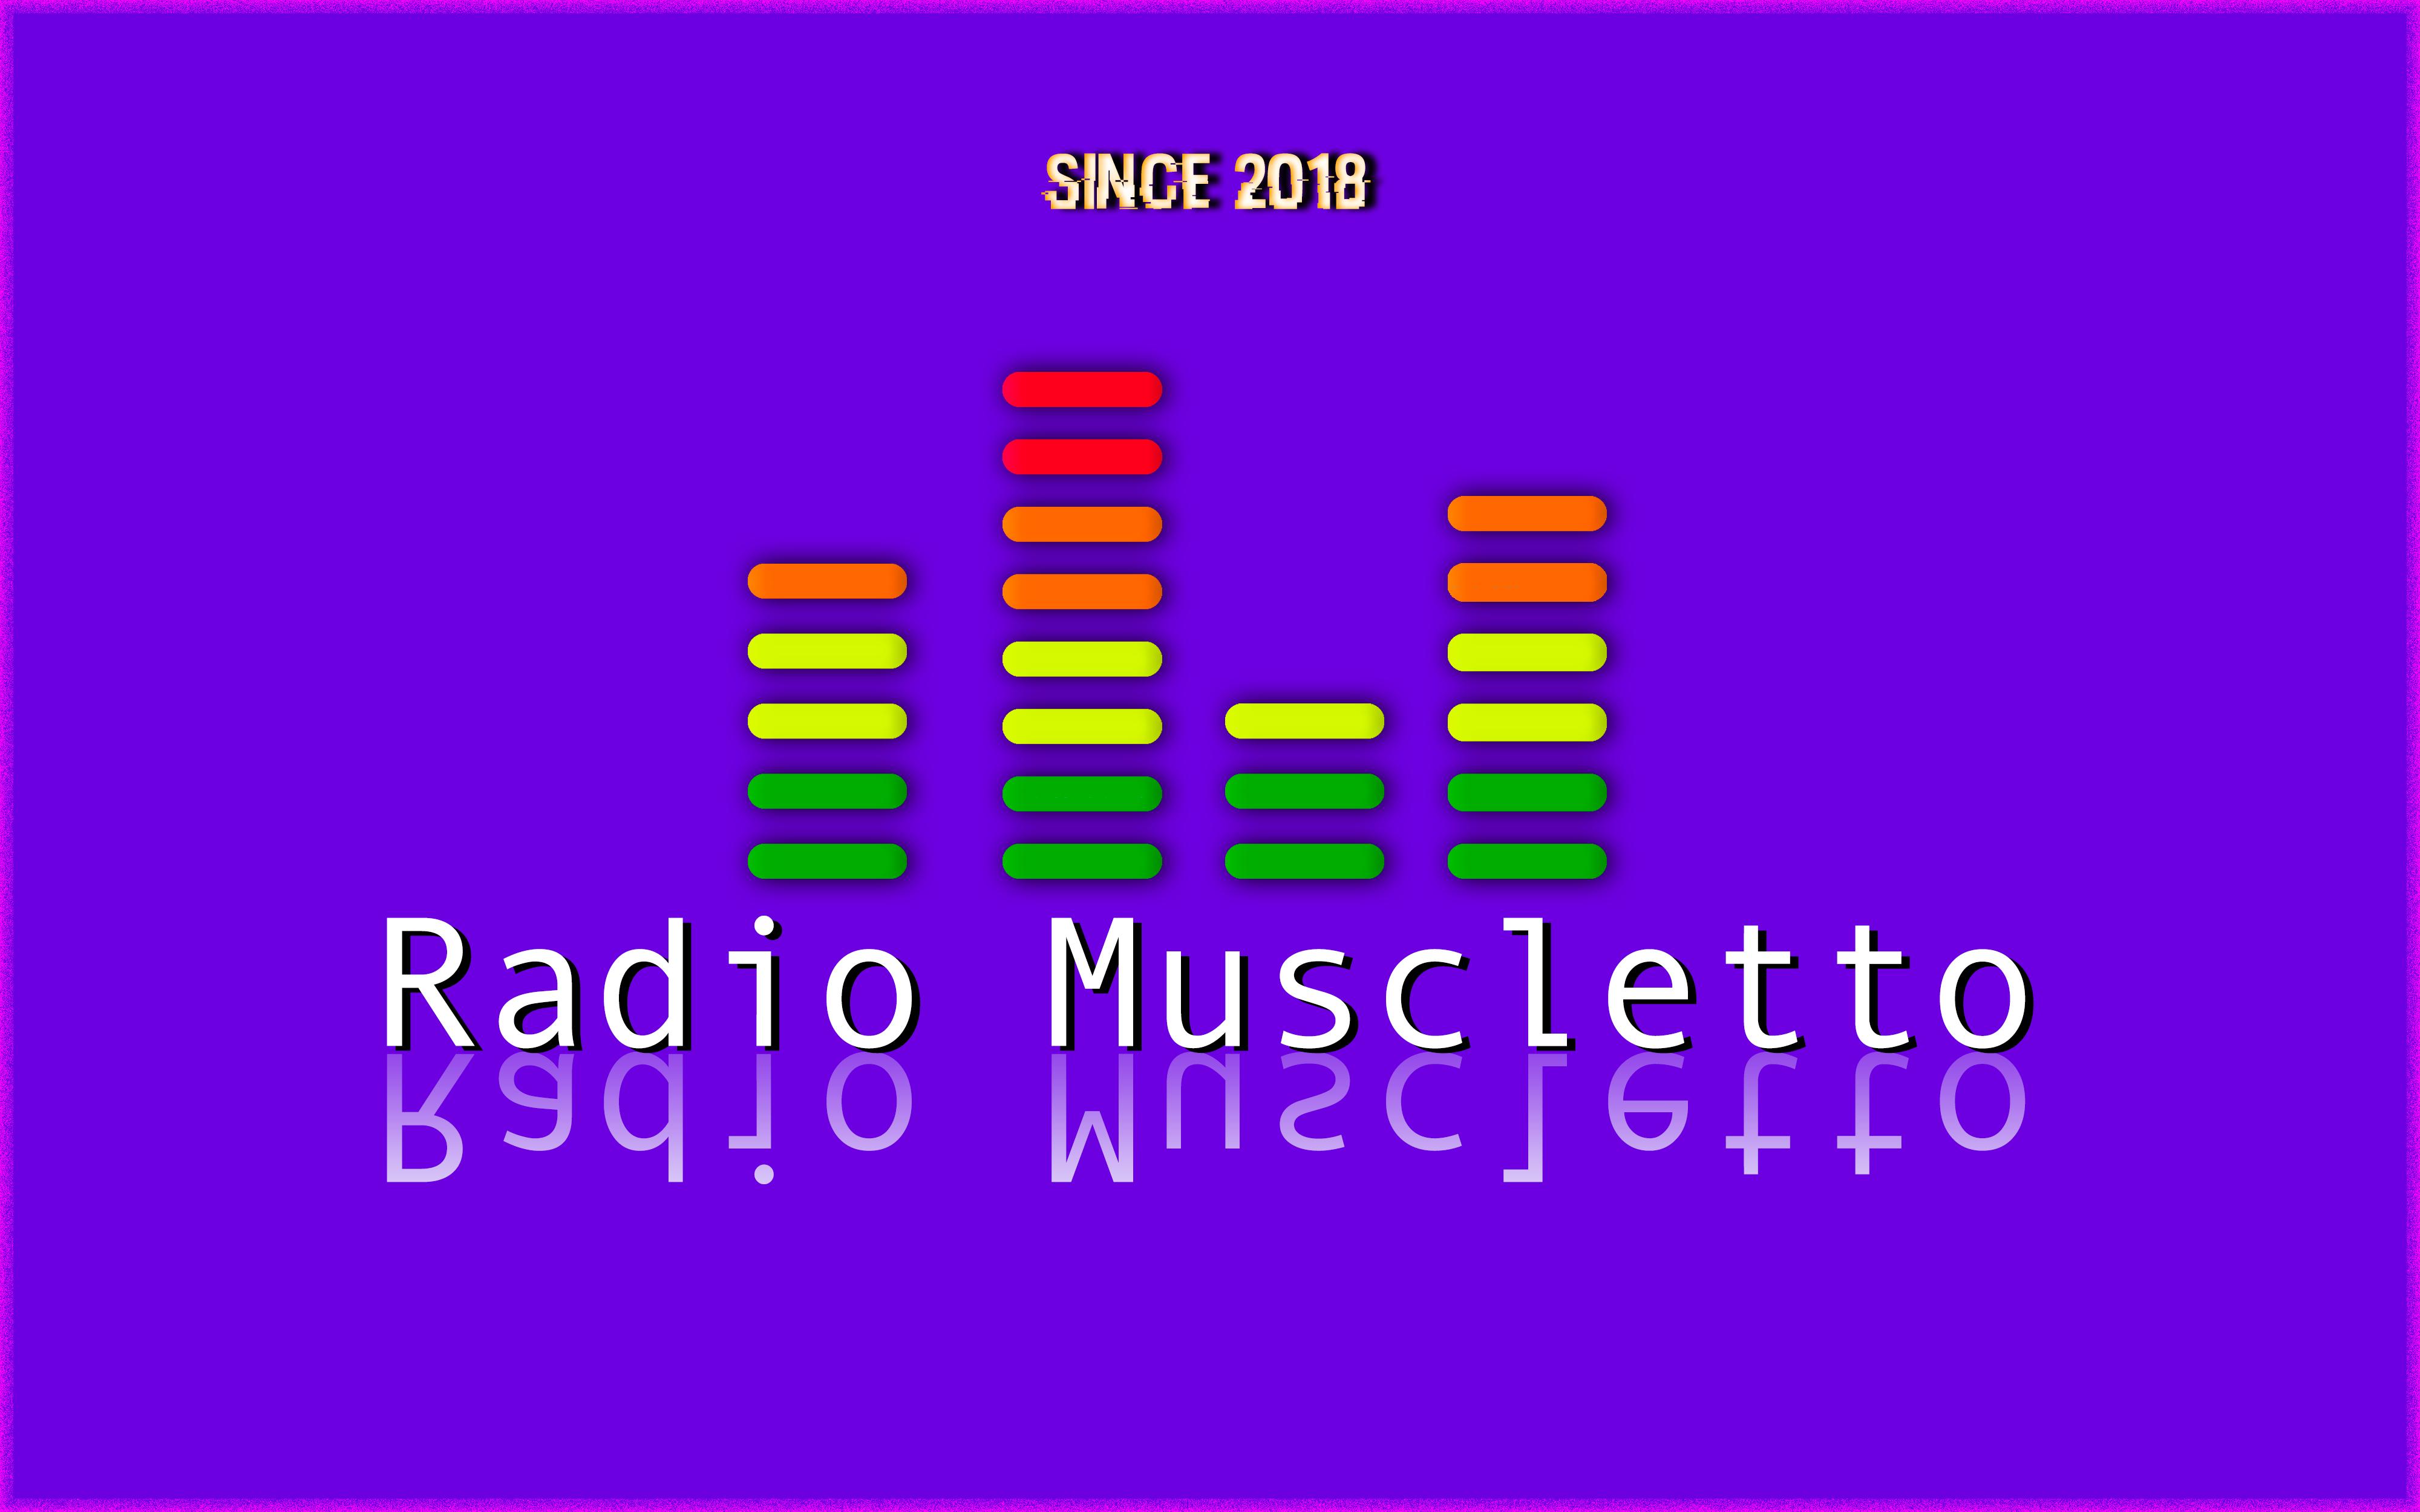 Radio Muscletto